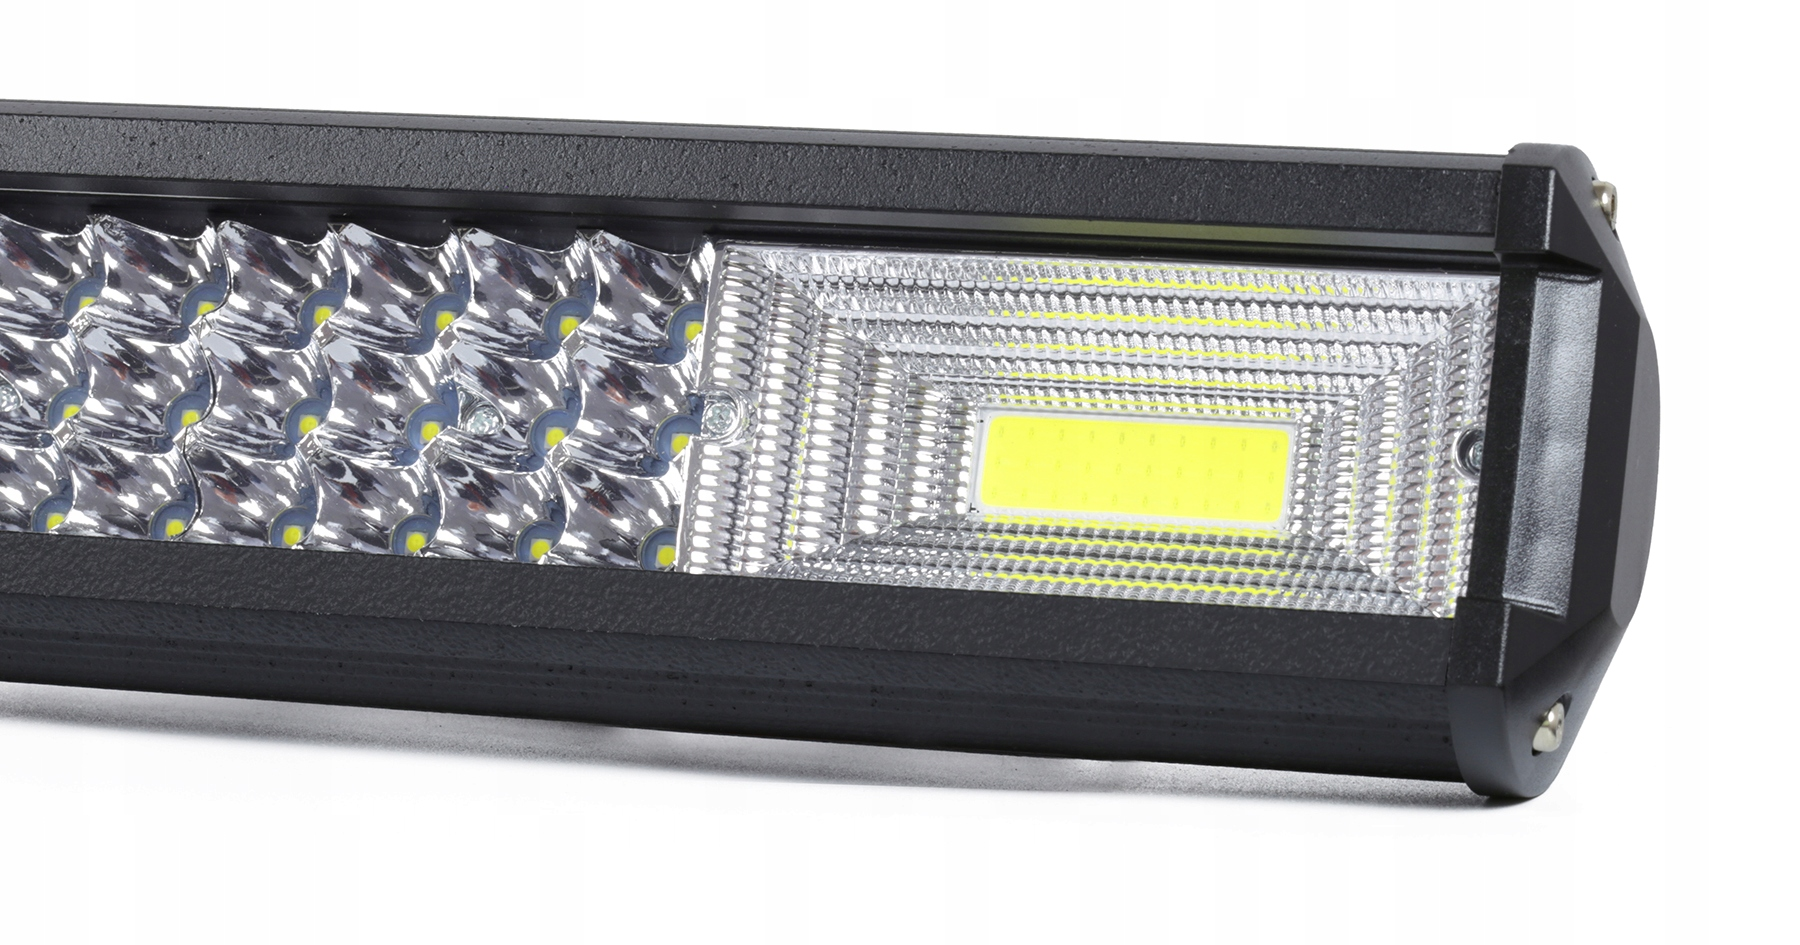 LED COB 432W HALOGEN SZPERACZ LAMPA ROBOCZA 12-24V Producent części Interlook